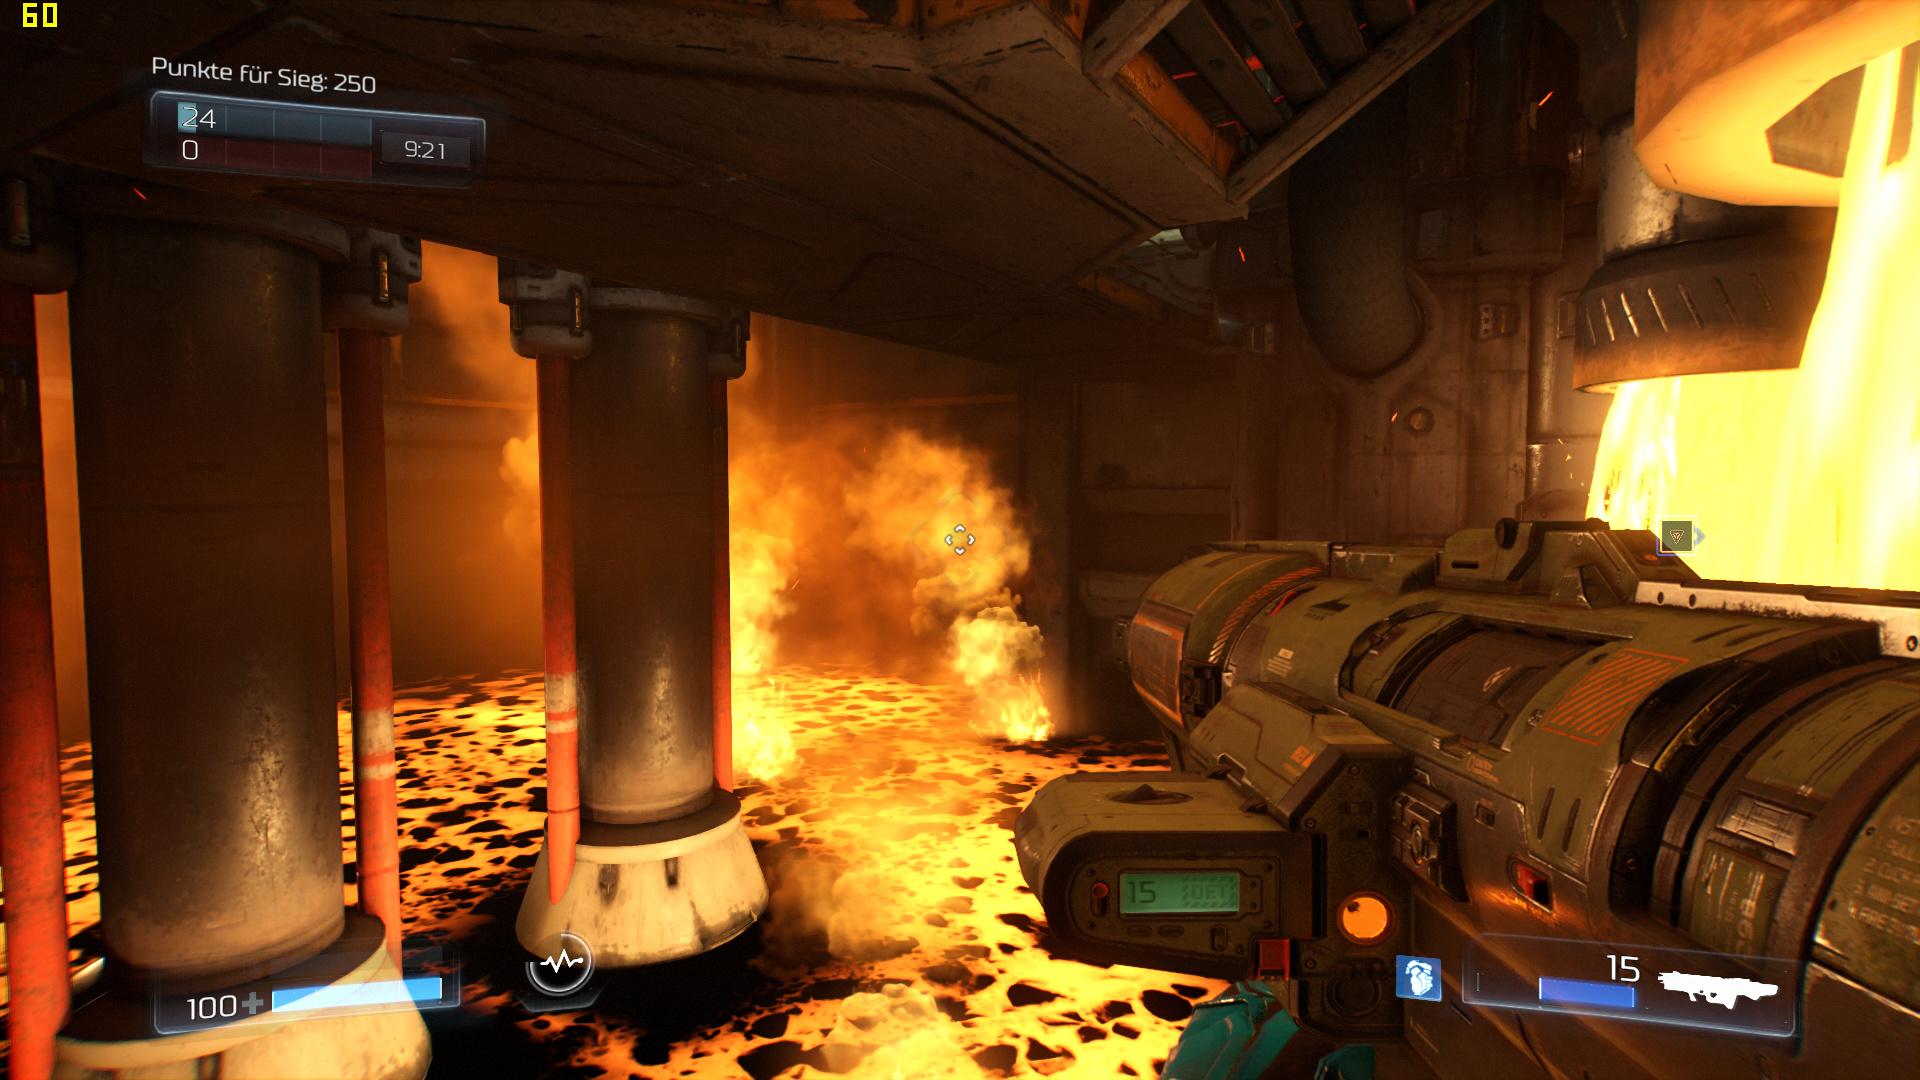 Doom Open Beta im Benchmark-Test: 60-Fps-Lock weiterhin aktiv, FoV